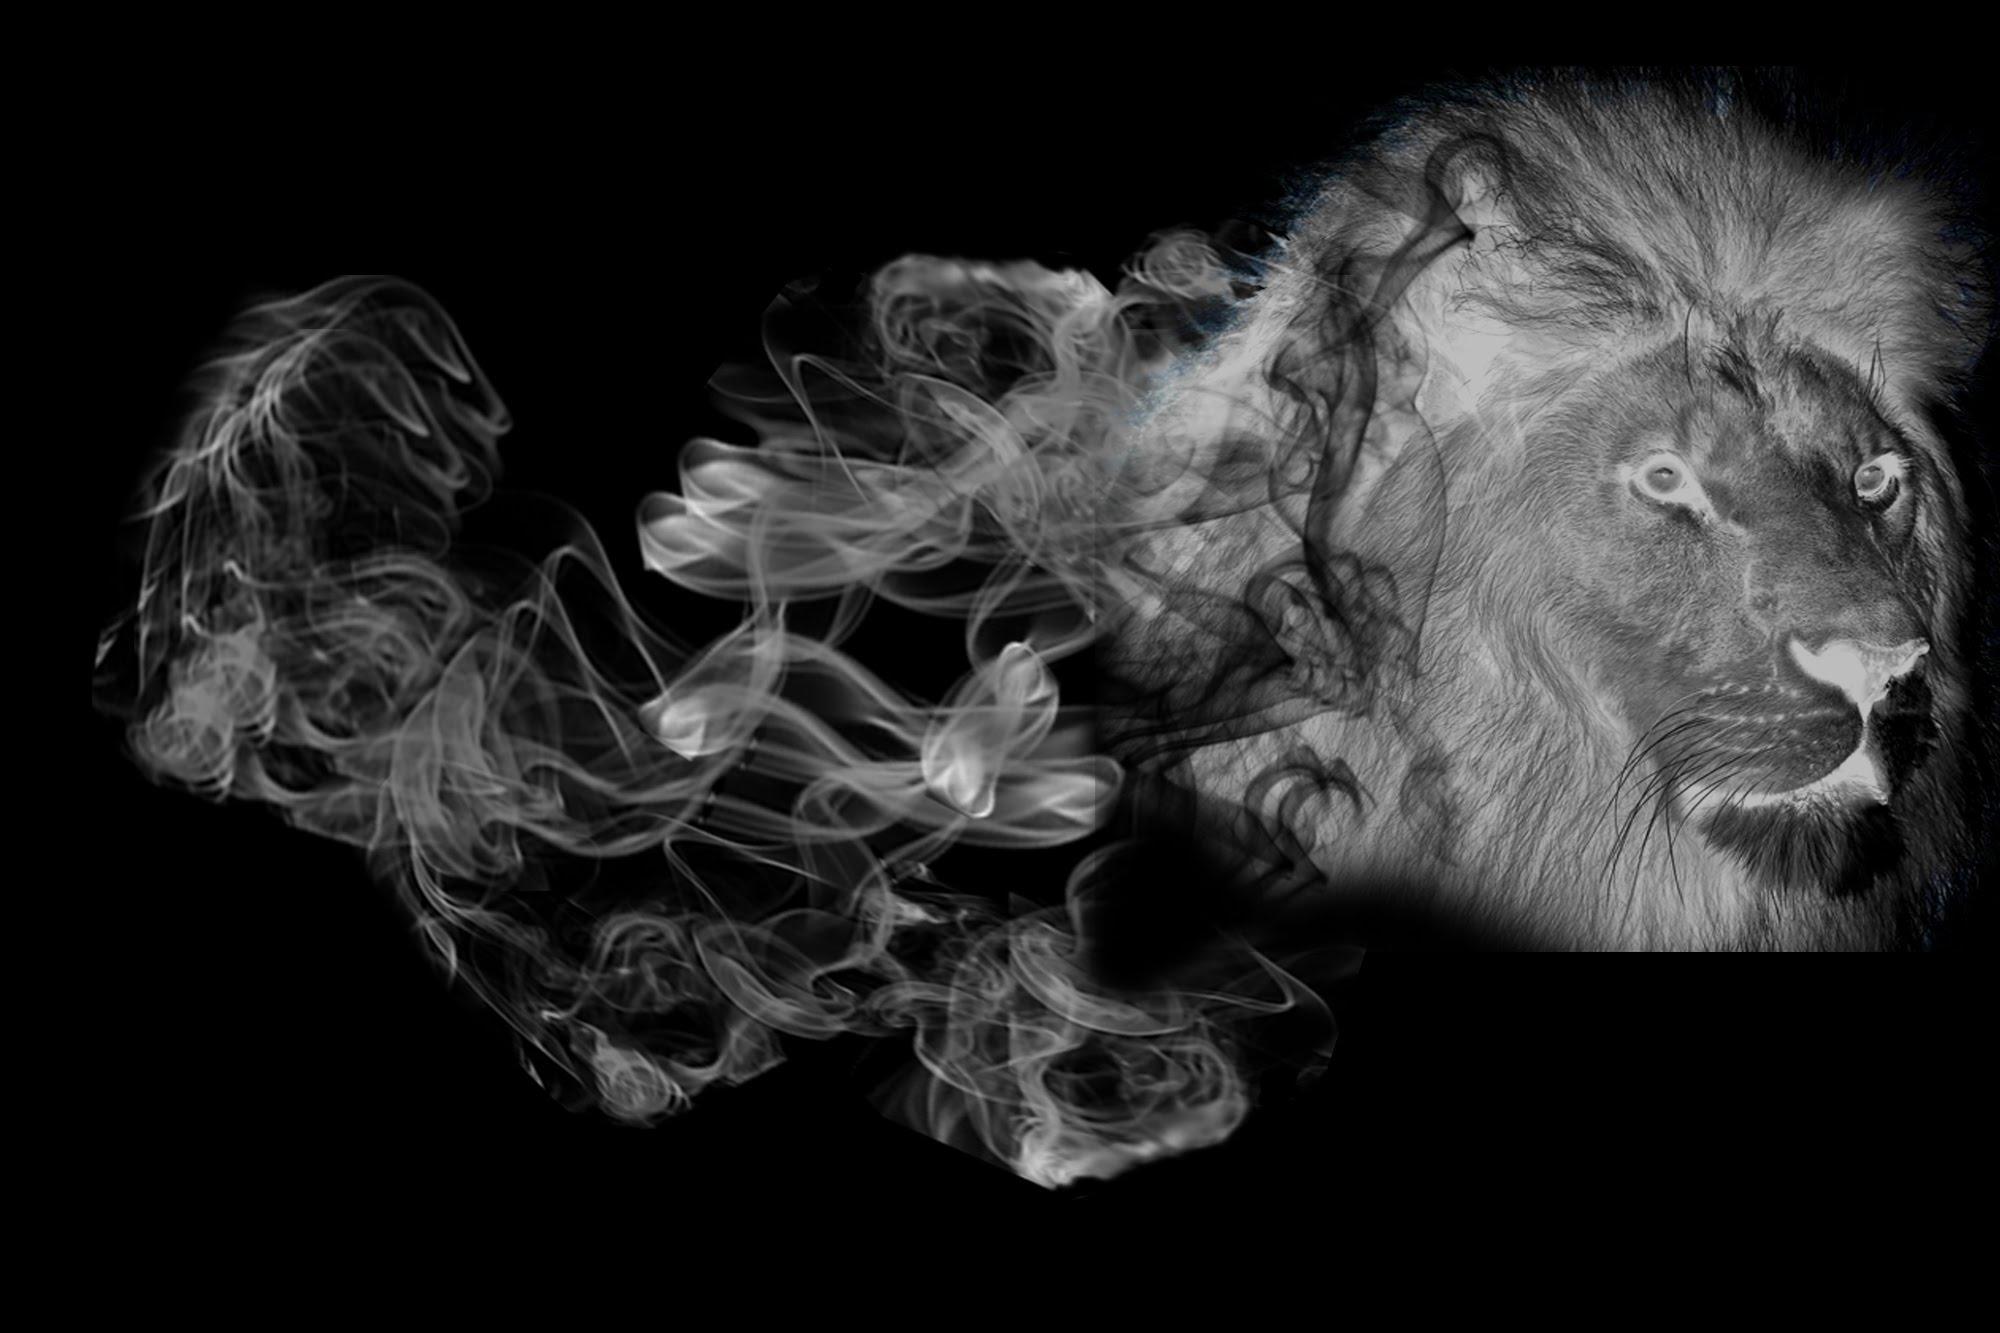 Adobe Photoshop How To Make A Smoke Effect - Smoke Effect PNG